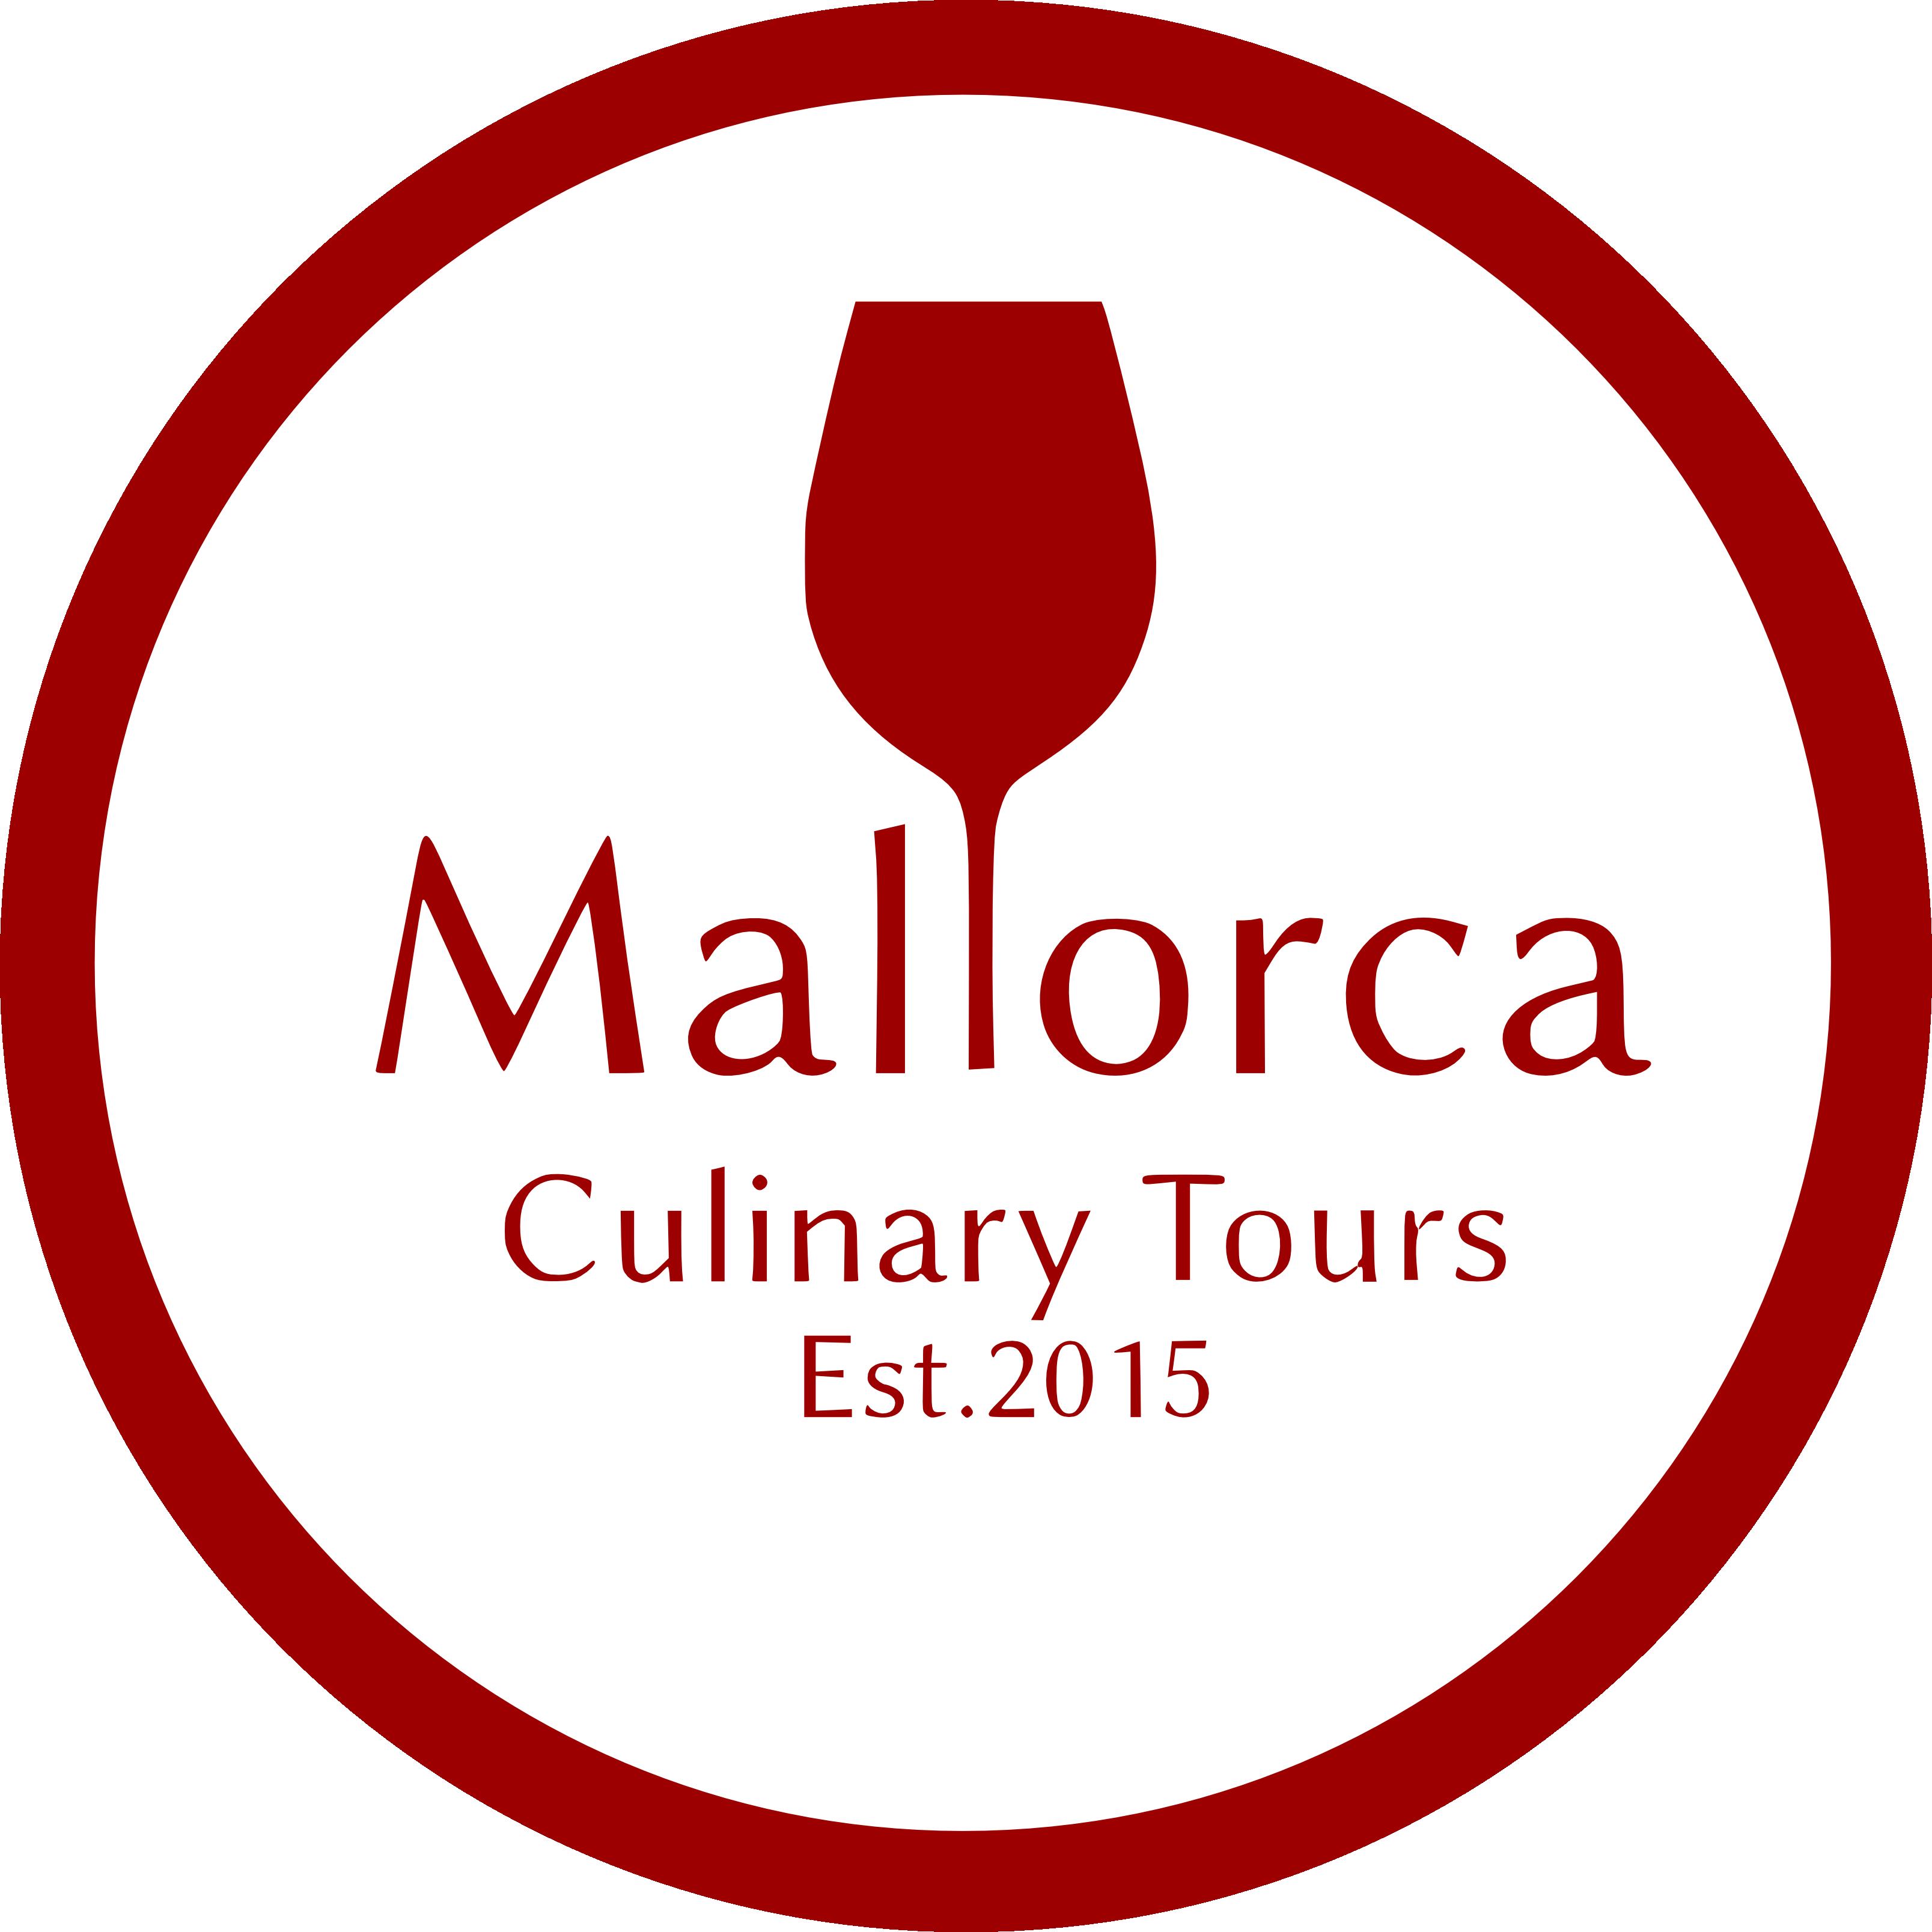 Mallorca Culinary Tours